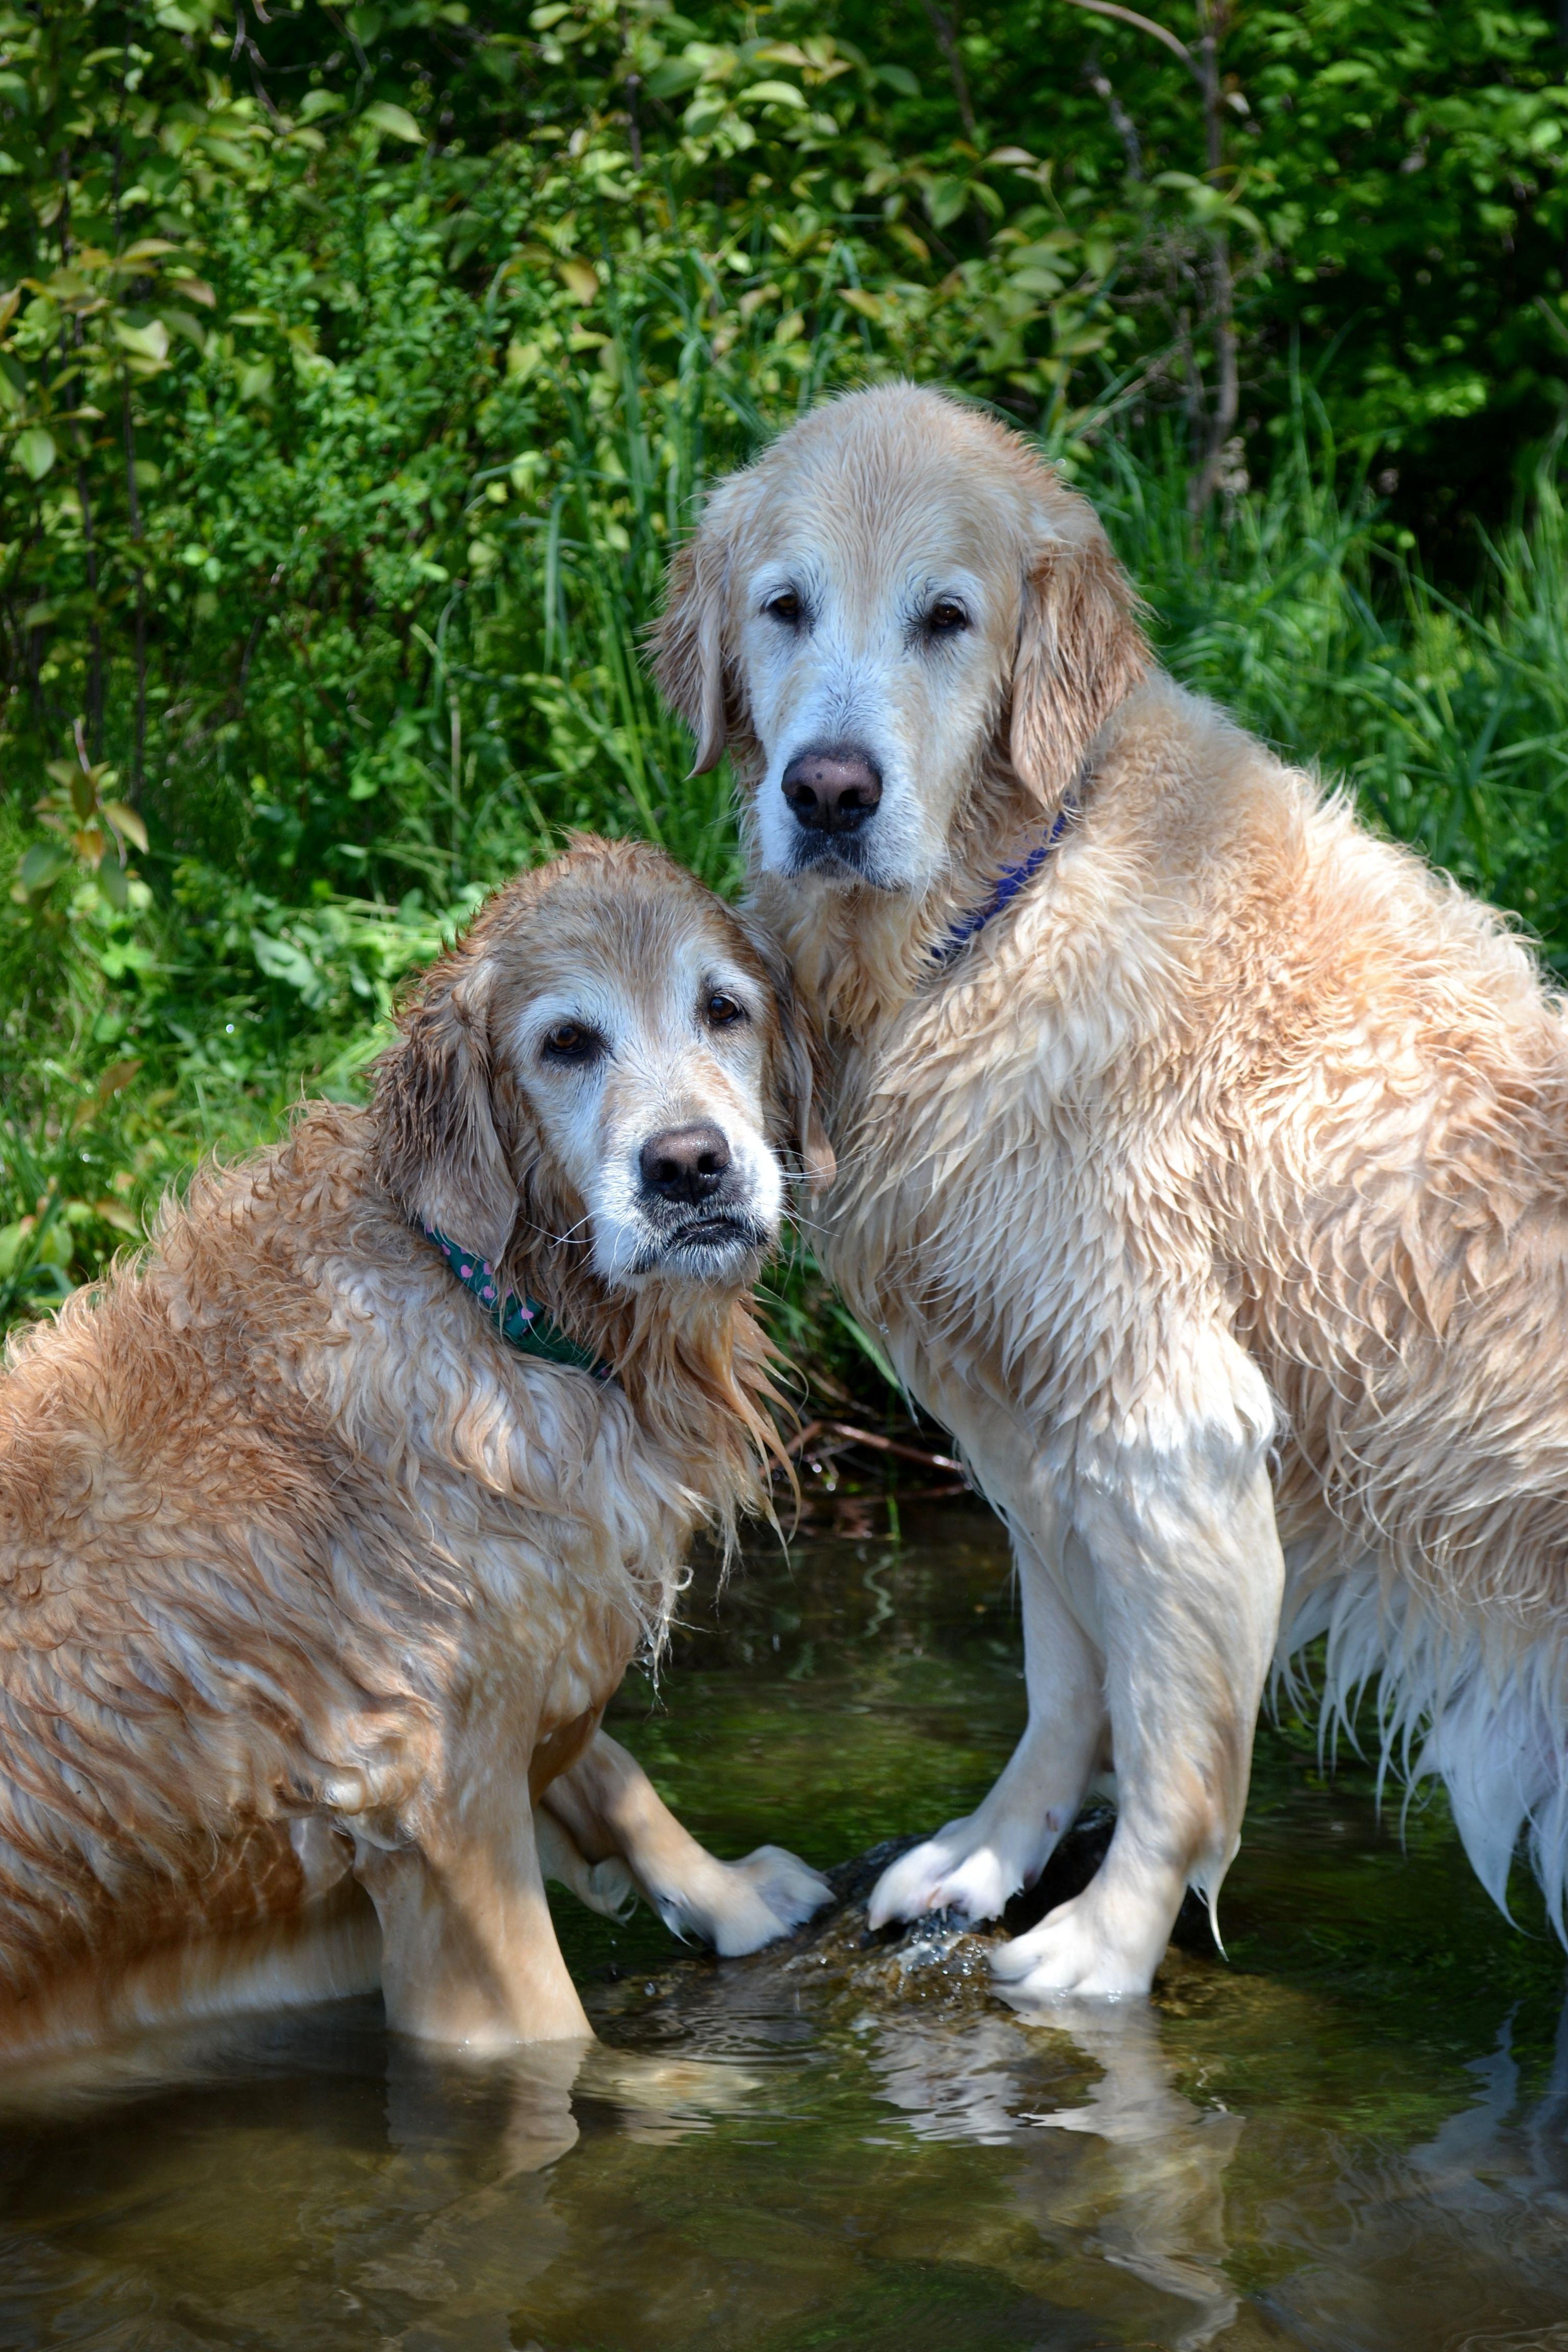 Brie And Ben Sharing A Rock Grand Dog Golden Retriever Pets